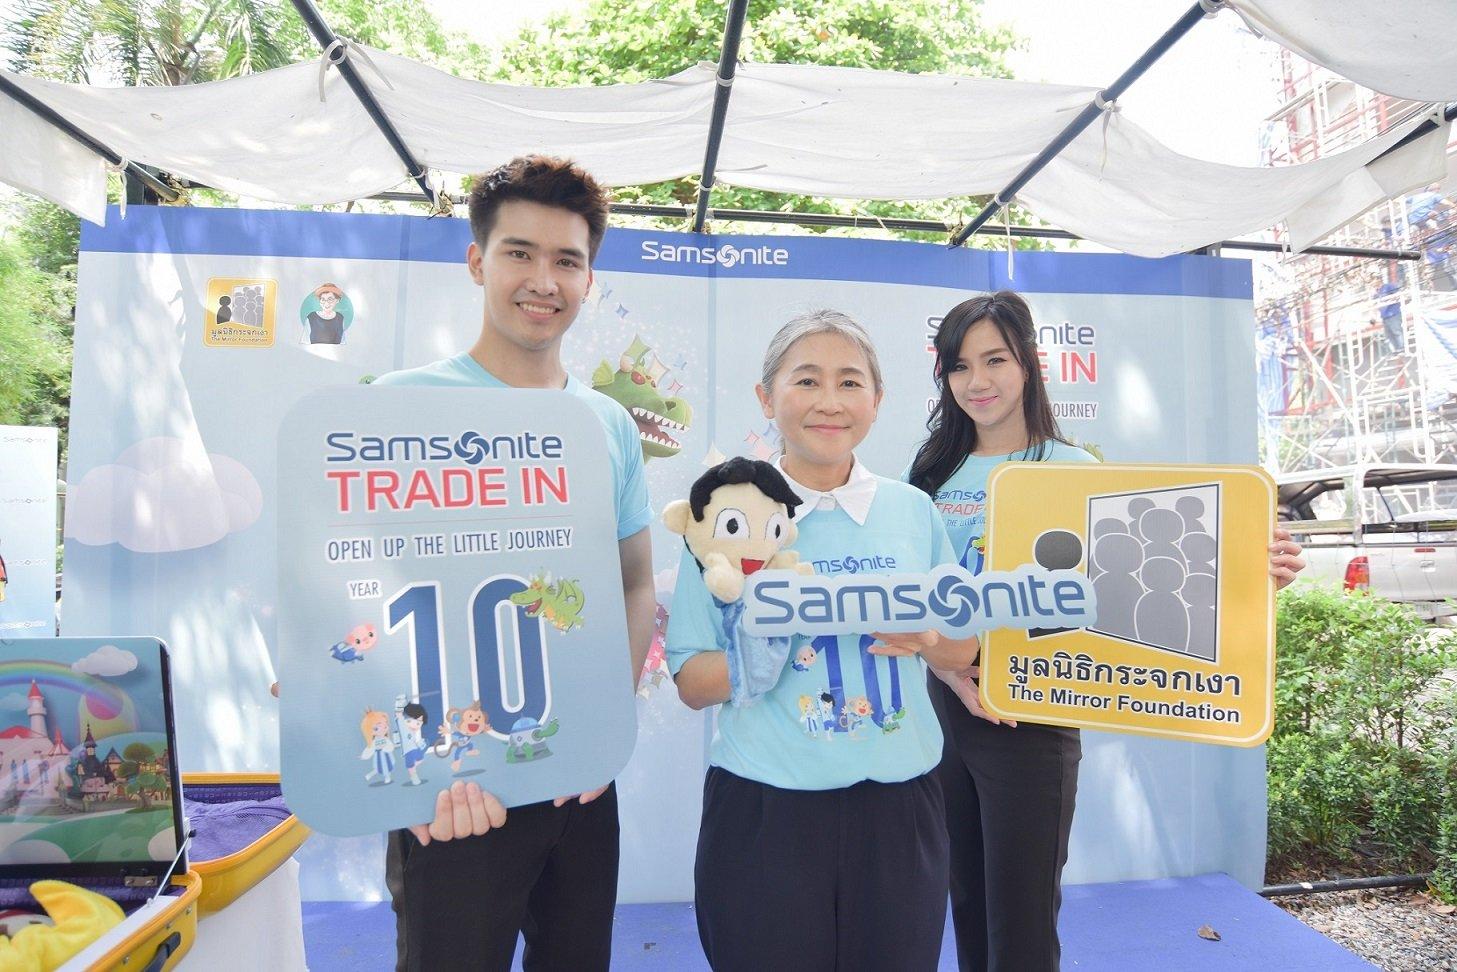 Samsonite กลับมาอีกครั้งกับโครงการดีๆ Samsonite Trade In ปีที่ 10 2 -